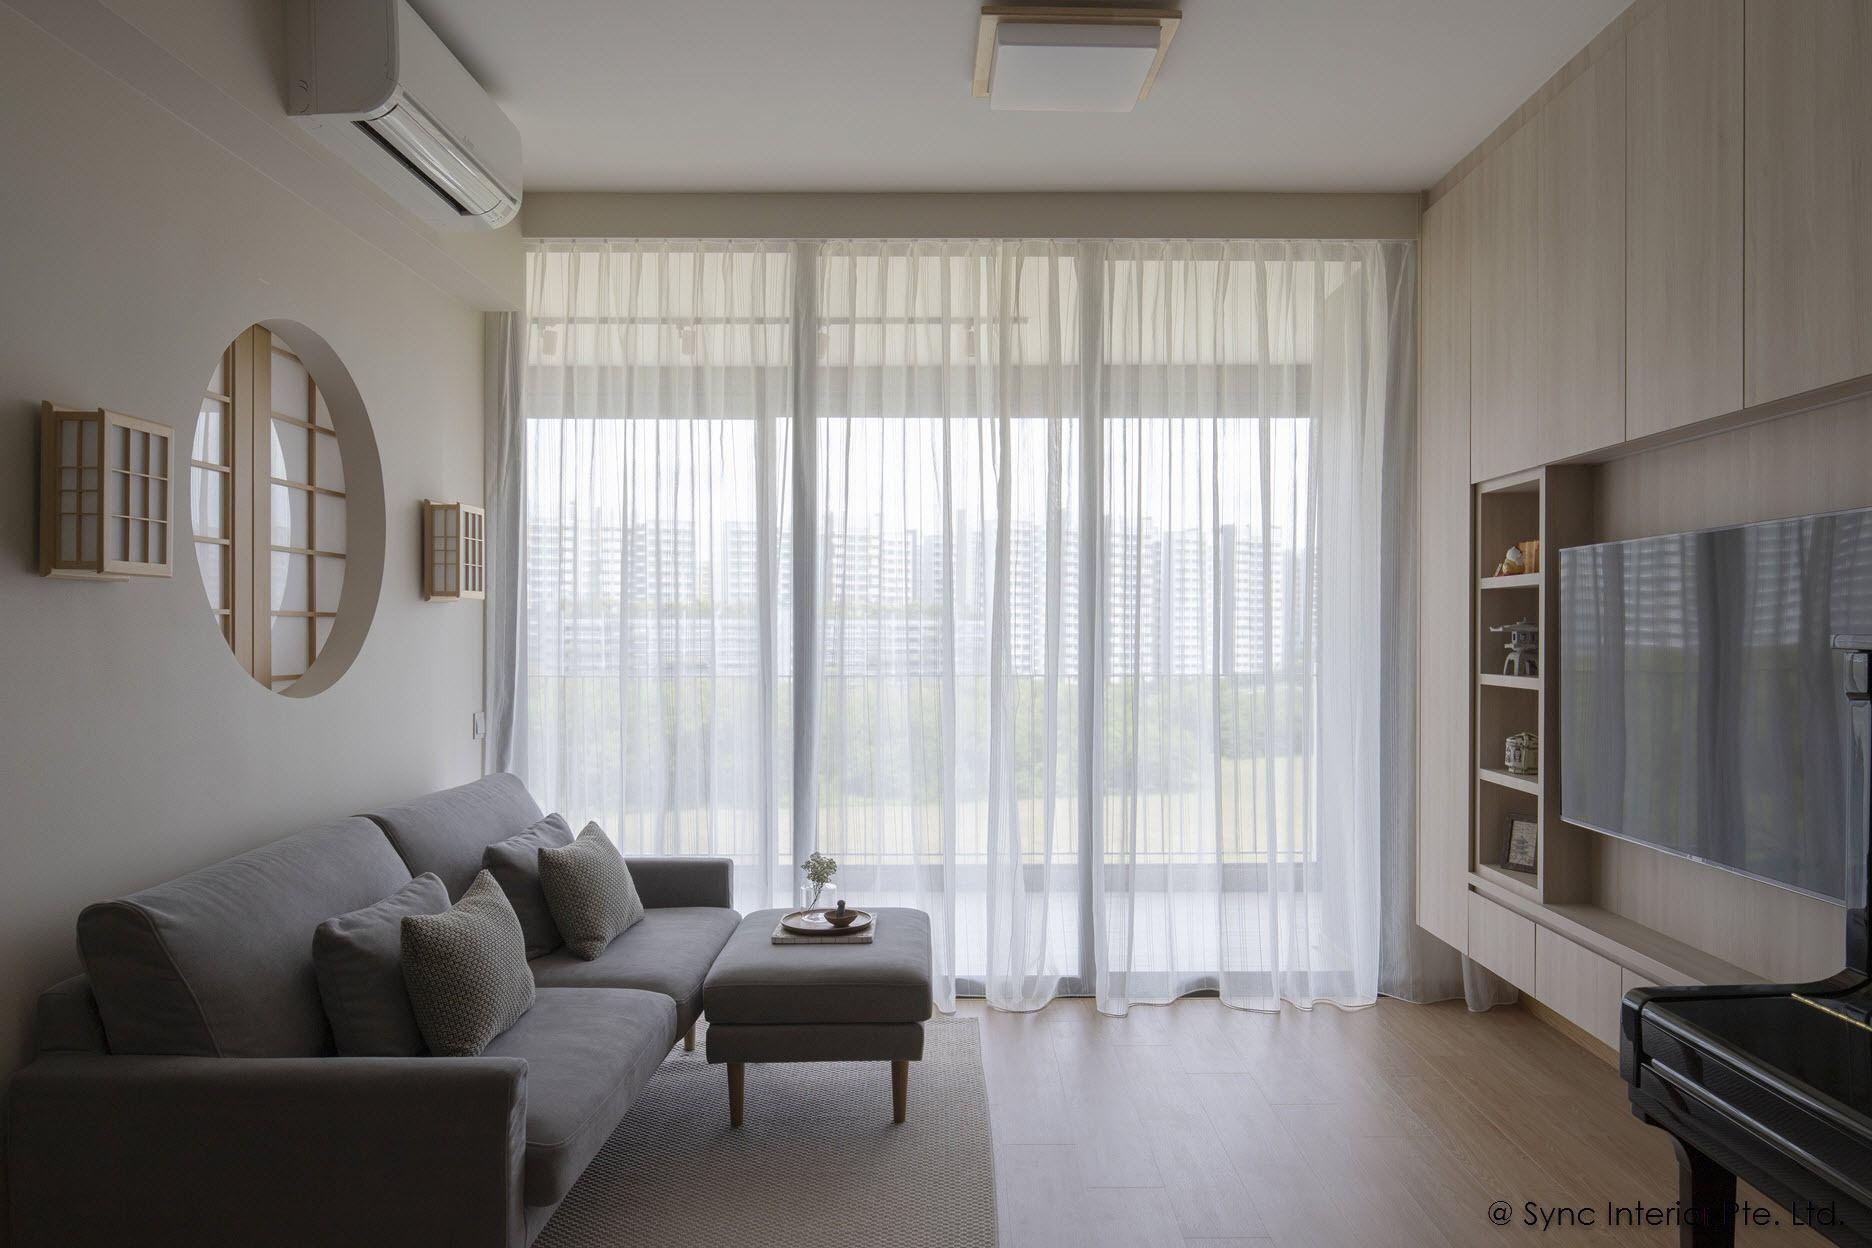 Japanese Concept Singapore Home Interior Syncinterior Interior